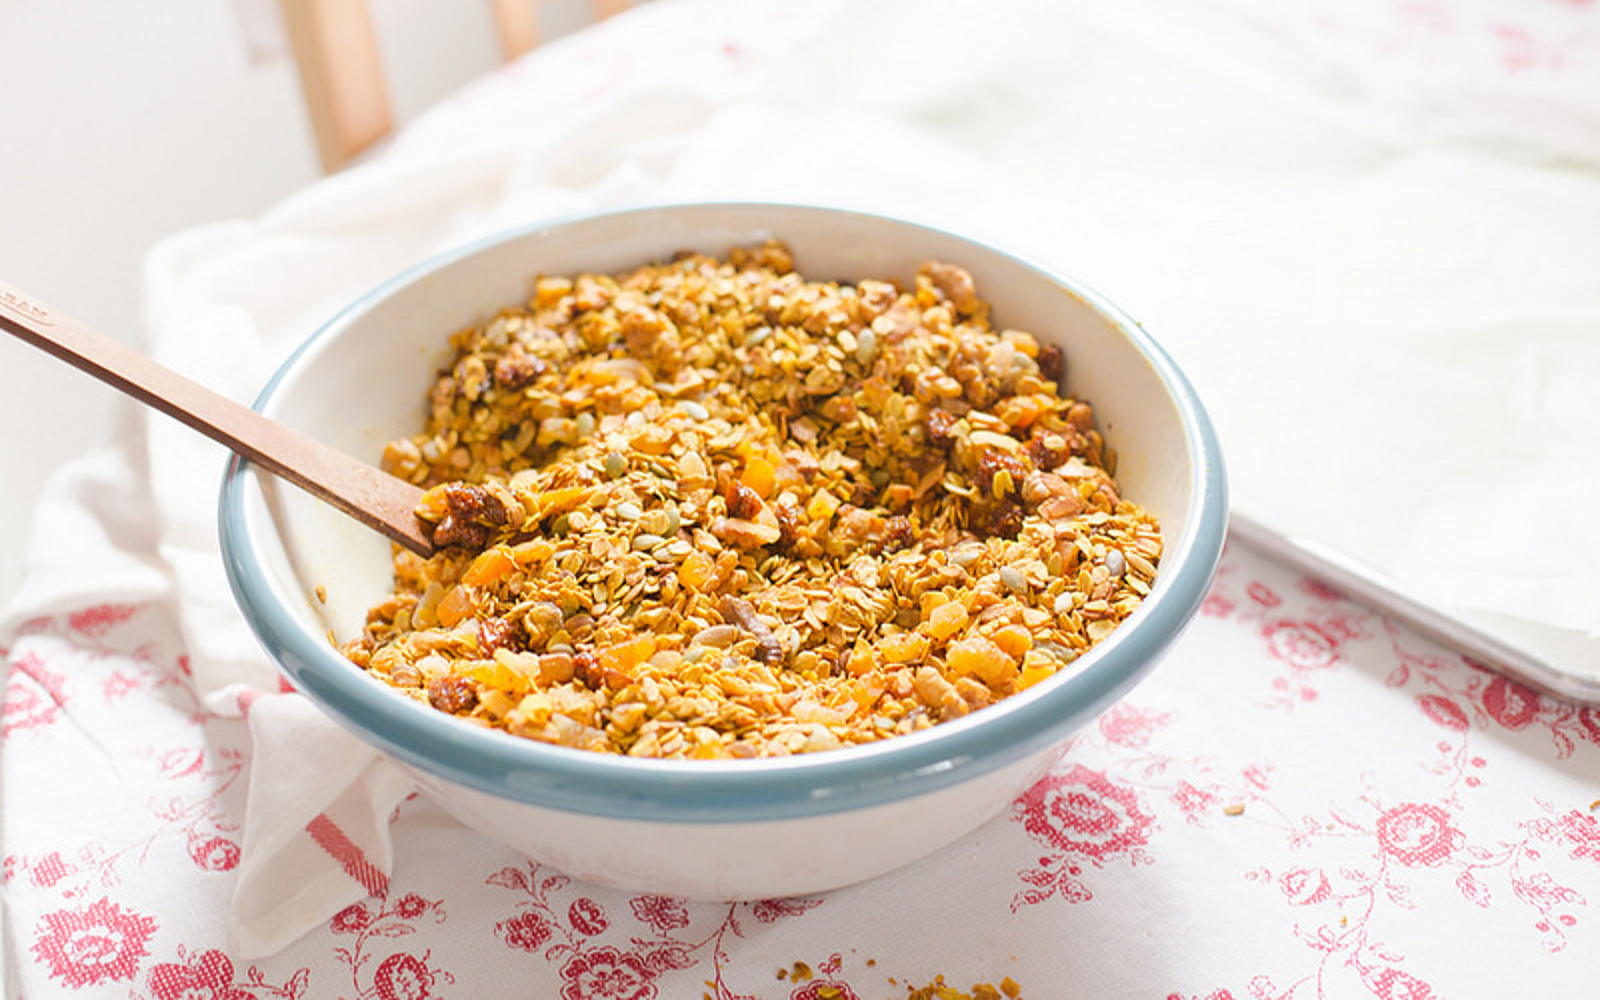 Vegan Gluten-Free Vegan Turmeric Granola with Goldenberry